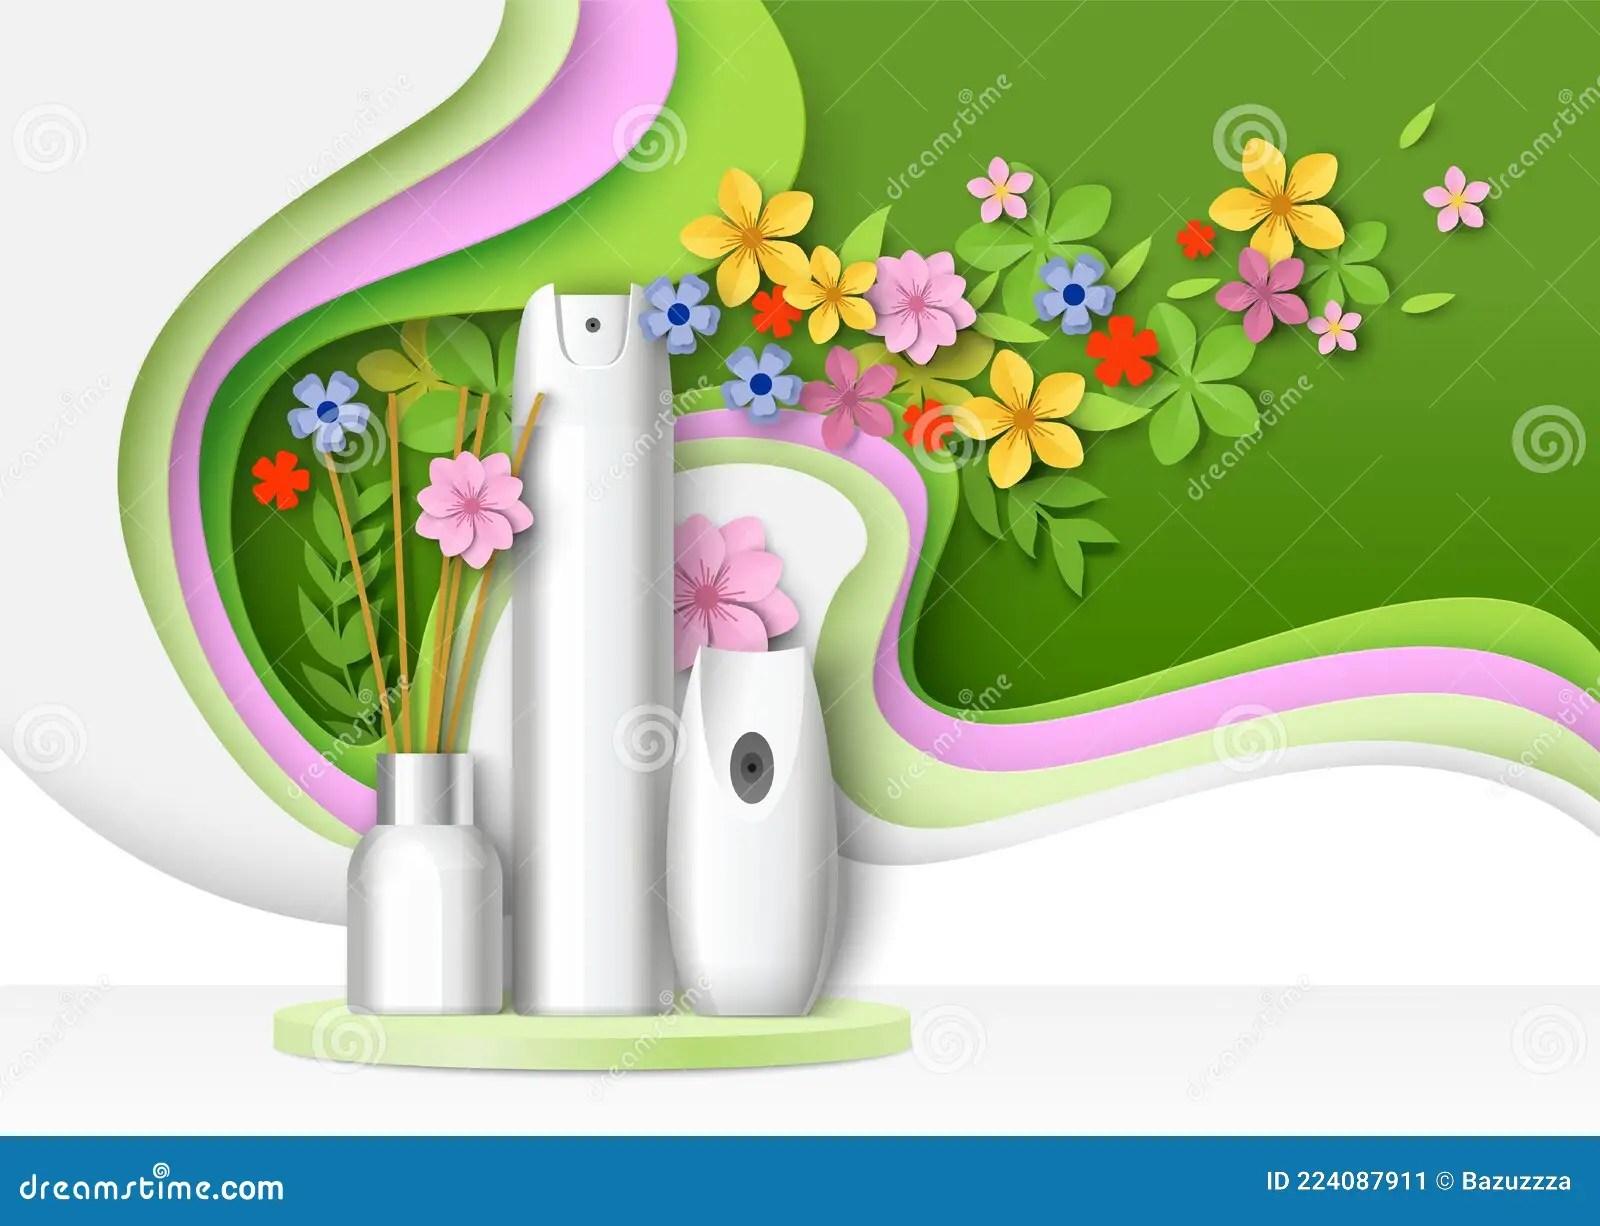 Psd | 36 mb rar. Air Freshener Packaging Bottle Aroma Stick Mockup Set On Podium Paper Cut Floral Background Vector Illustration Stock Vector Illustration Of Package Clean 224087911